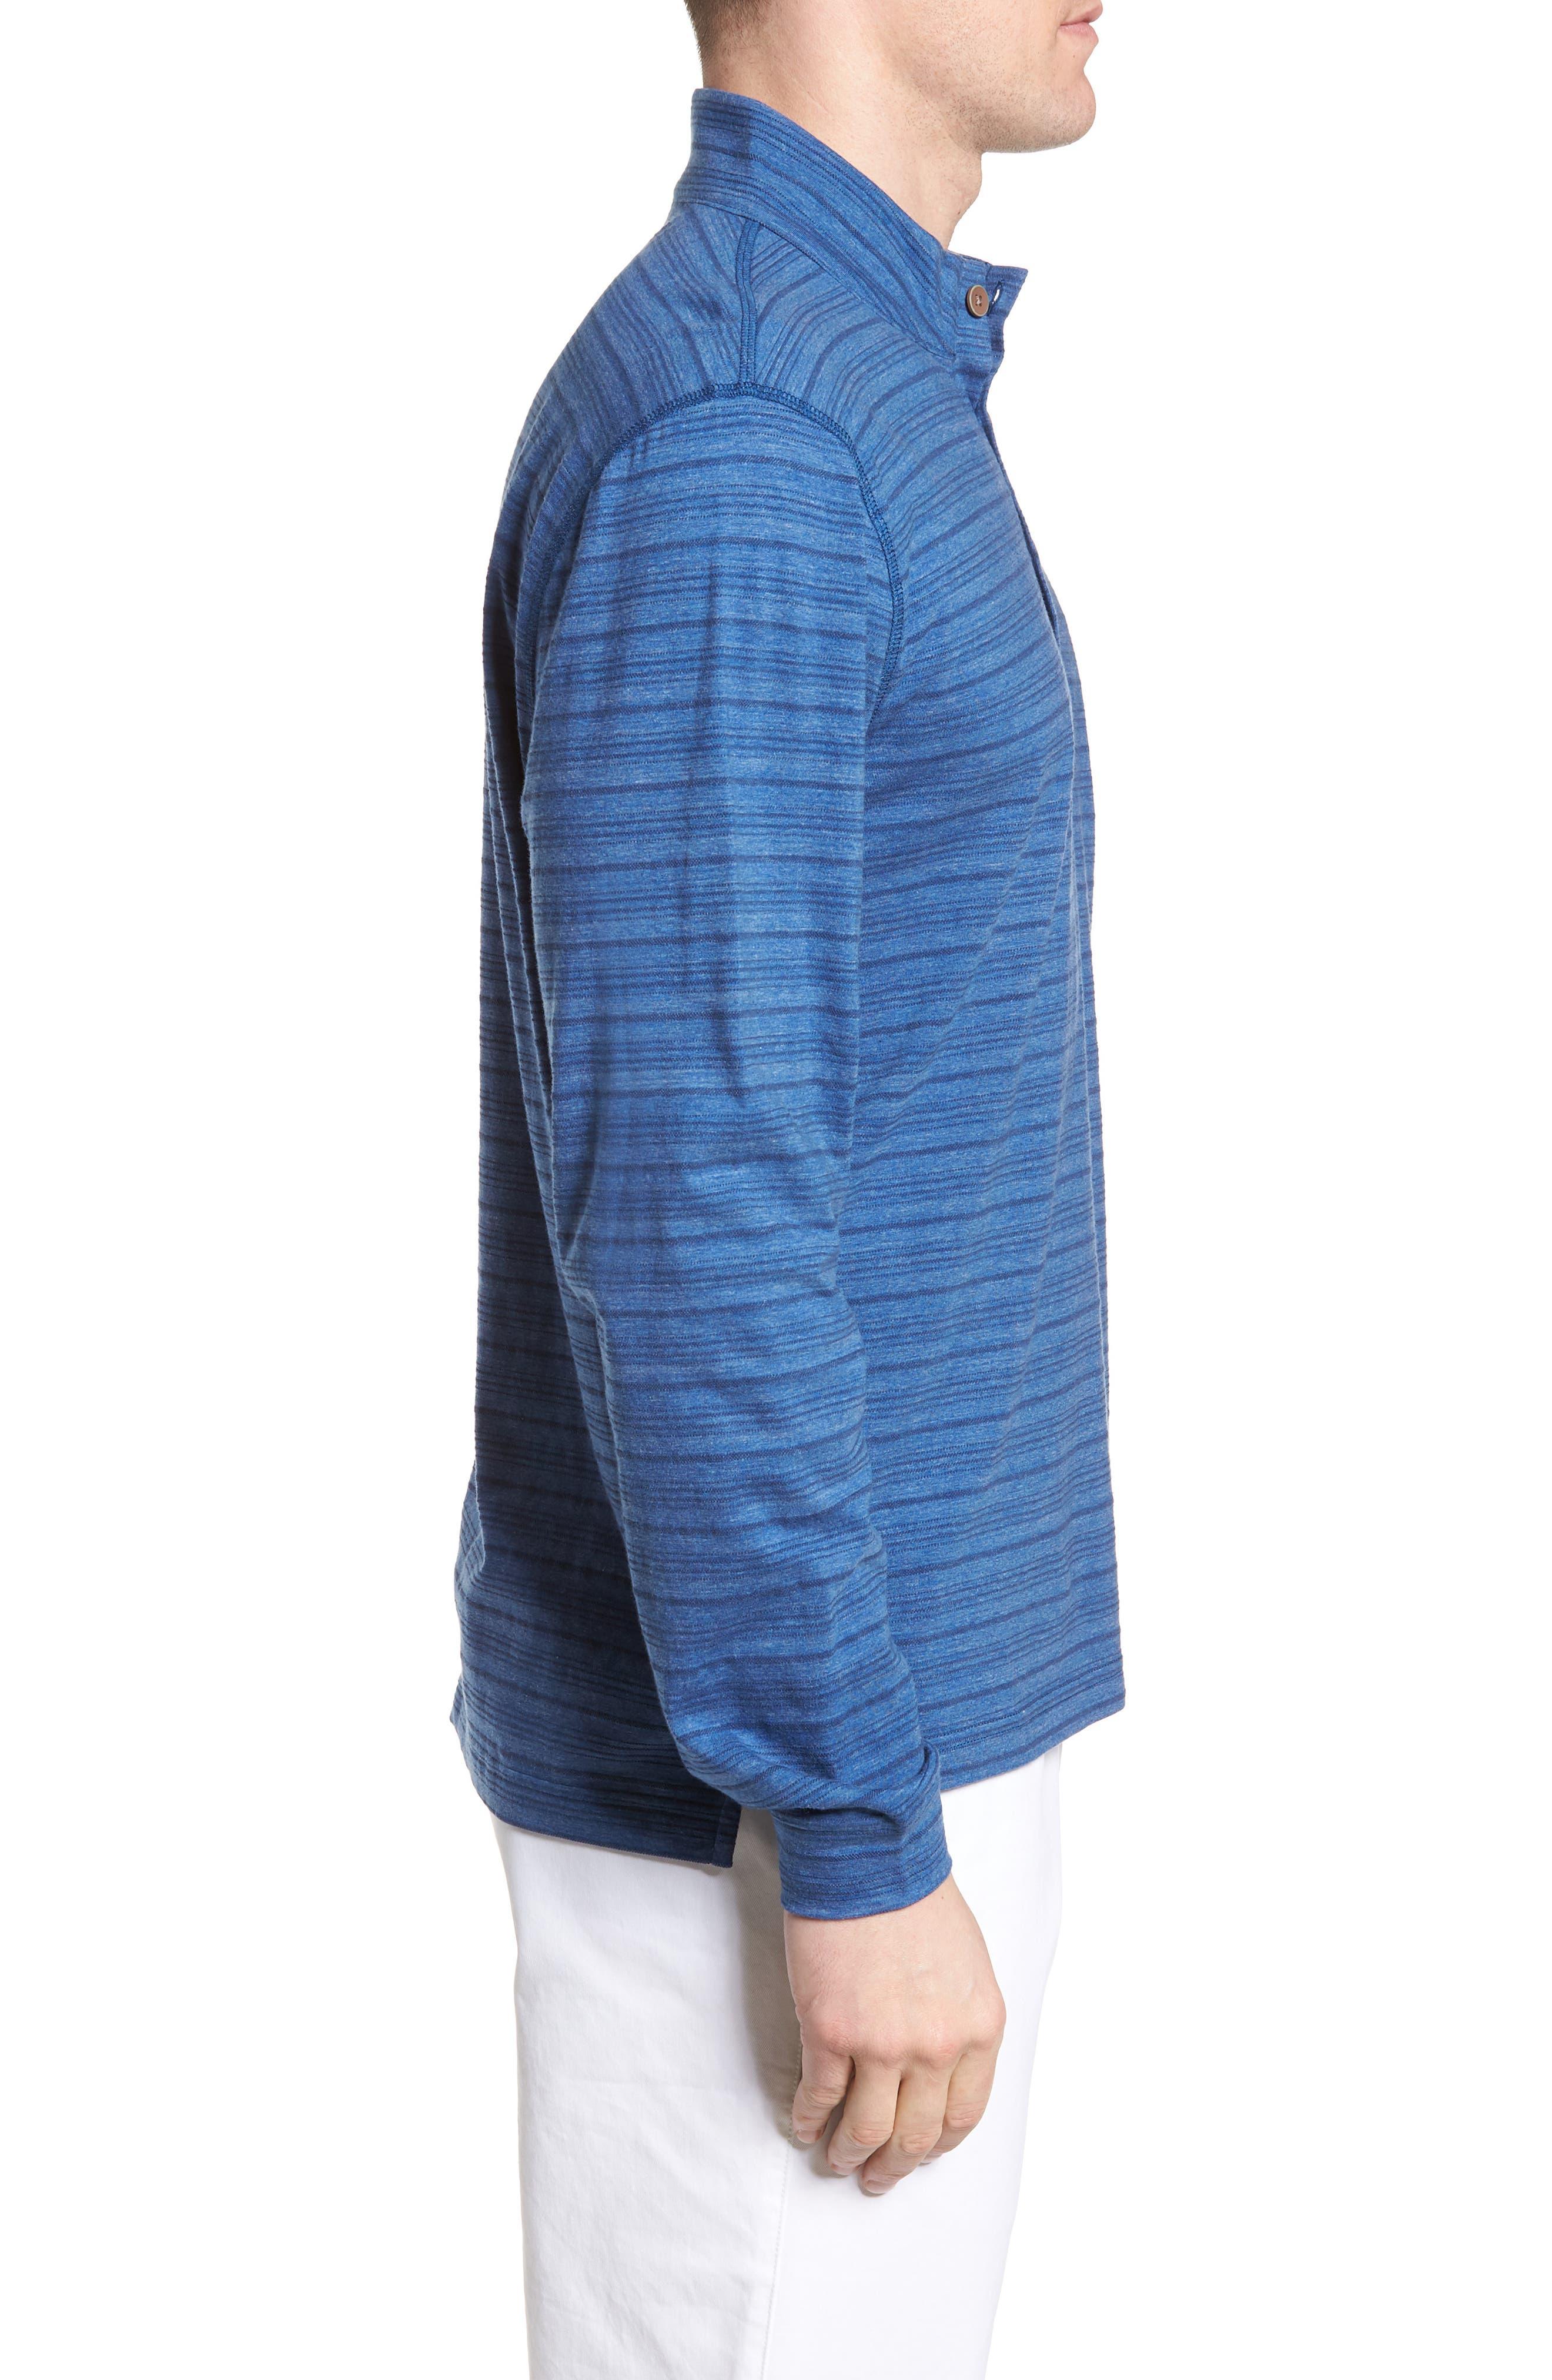 Calder Regular Fit T-Shirt,                             Alternate thumbnail 3, color,                             200